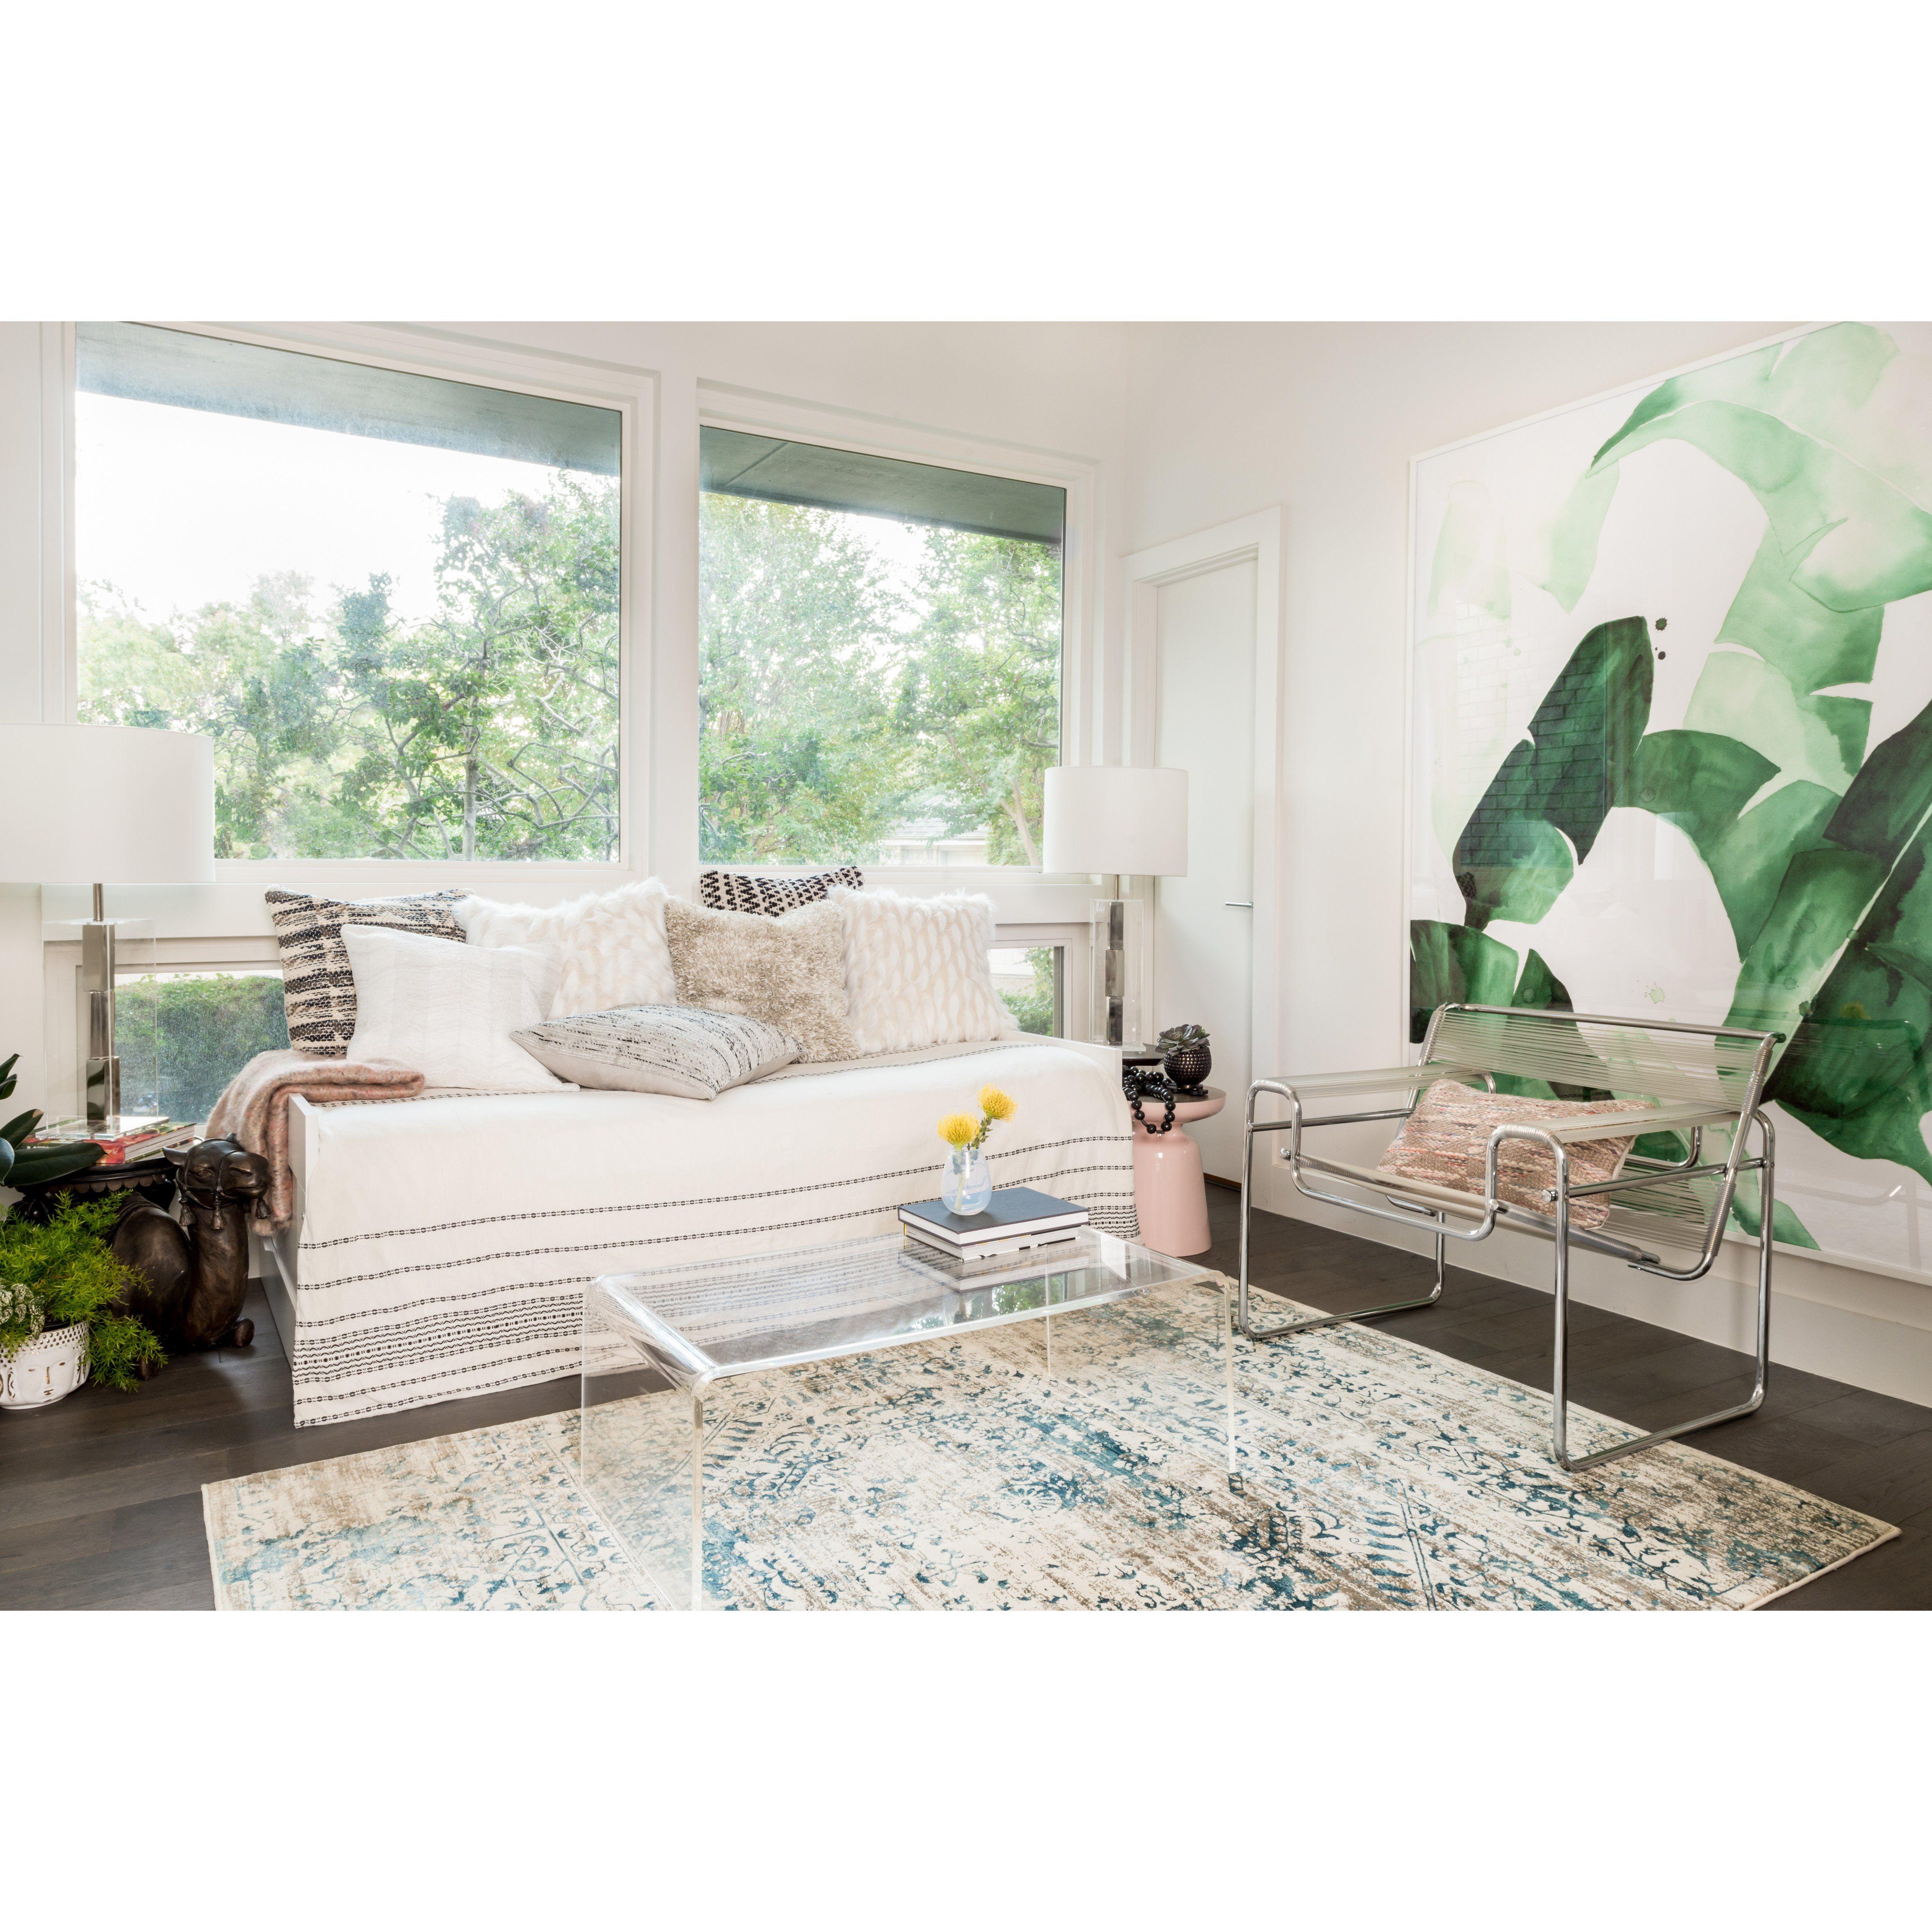 Loloi Rugs Kingston Ivory Area Rug | Living Room | Pinterest ...